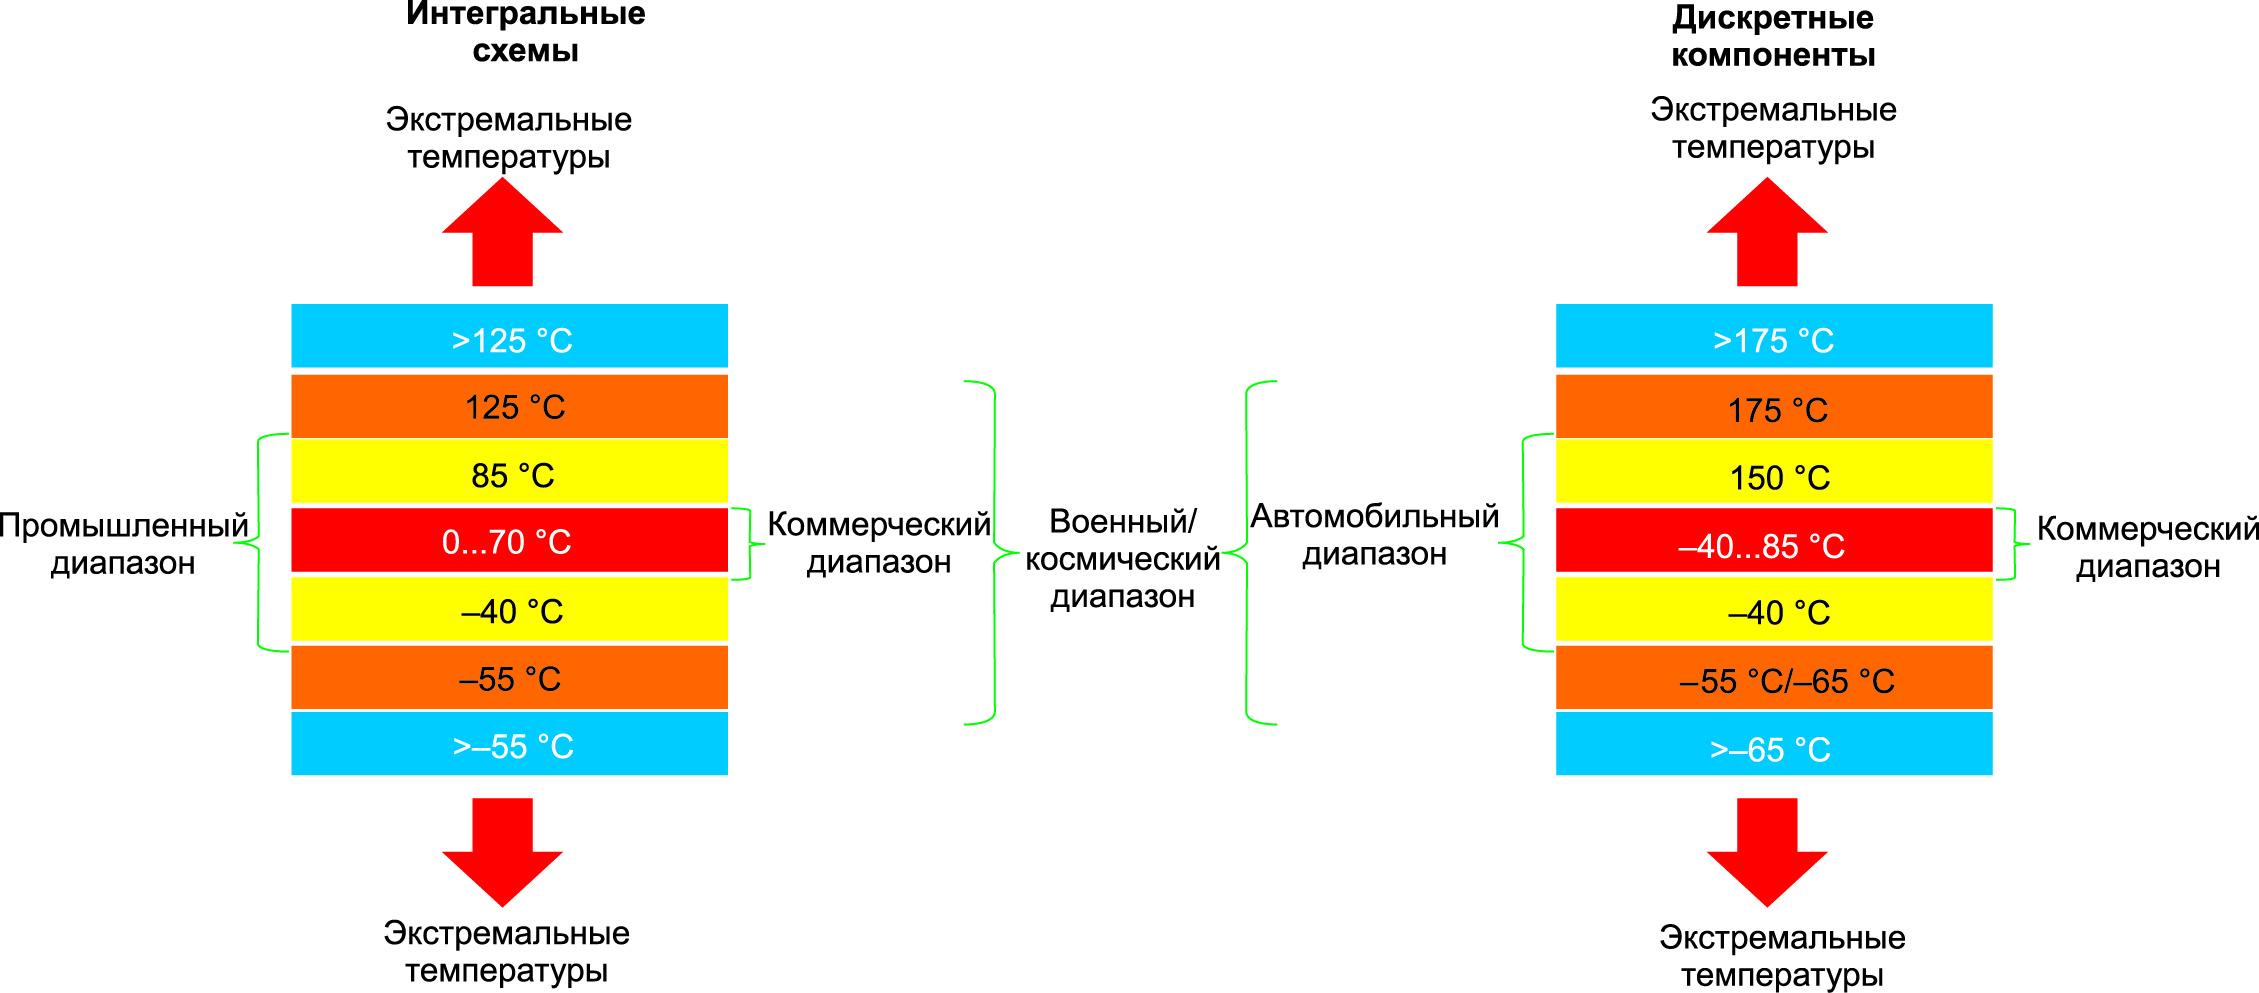 Стандартные диапазоны рабочих температур